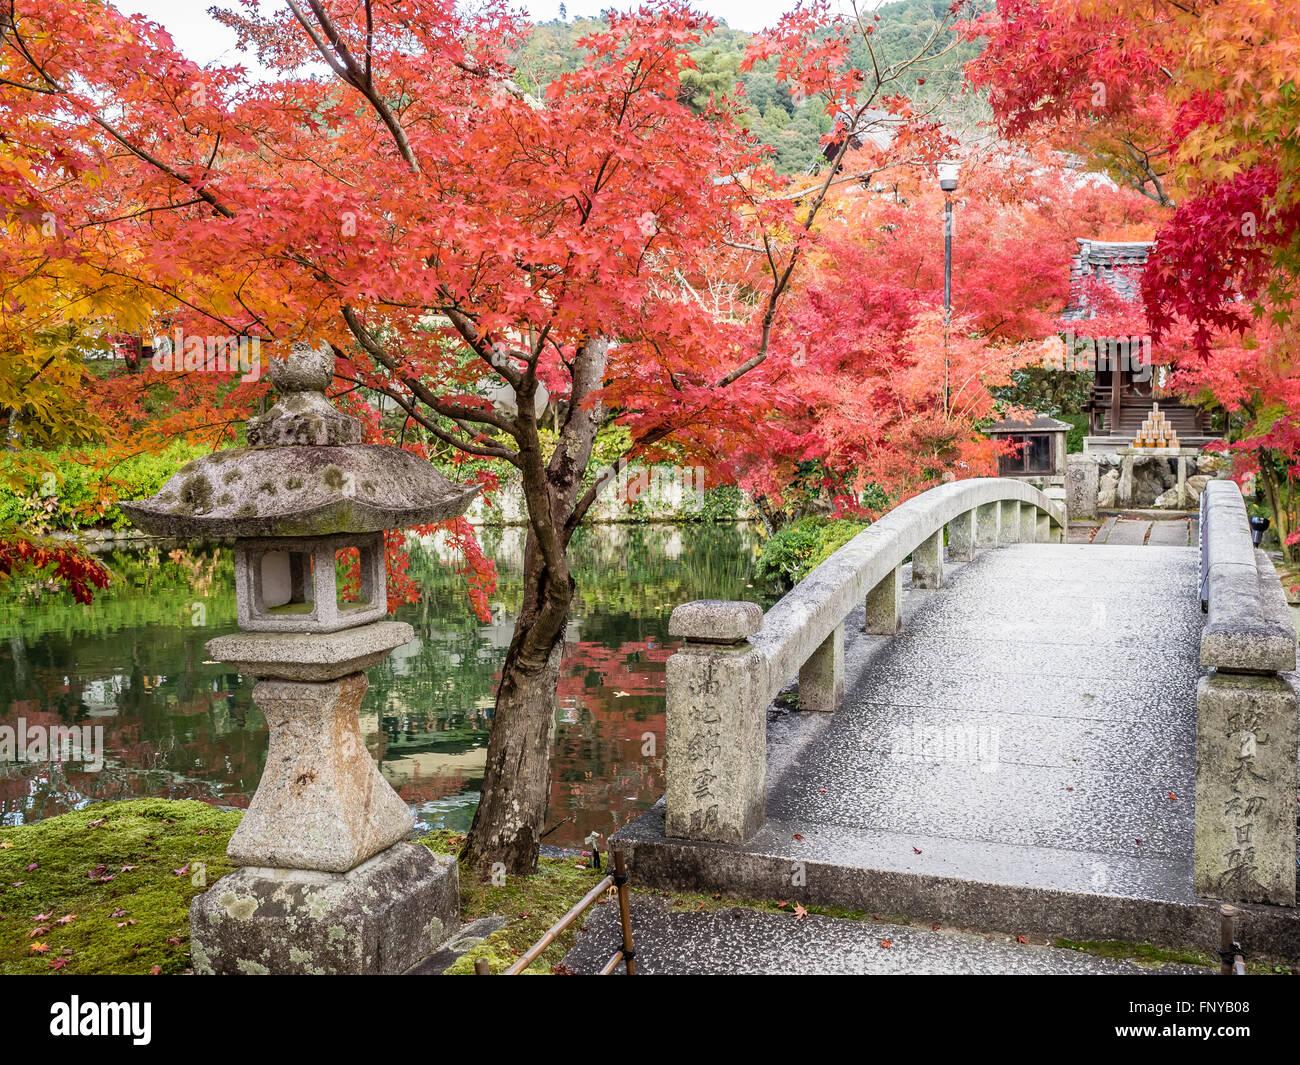 Japanese Zen Garden Bridge And Stone Lantern In Autumn Stock Photo